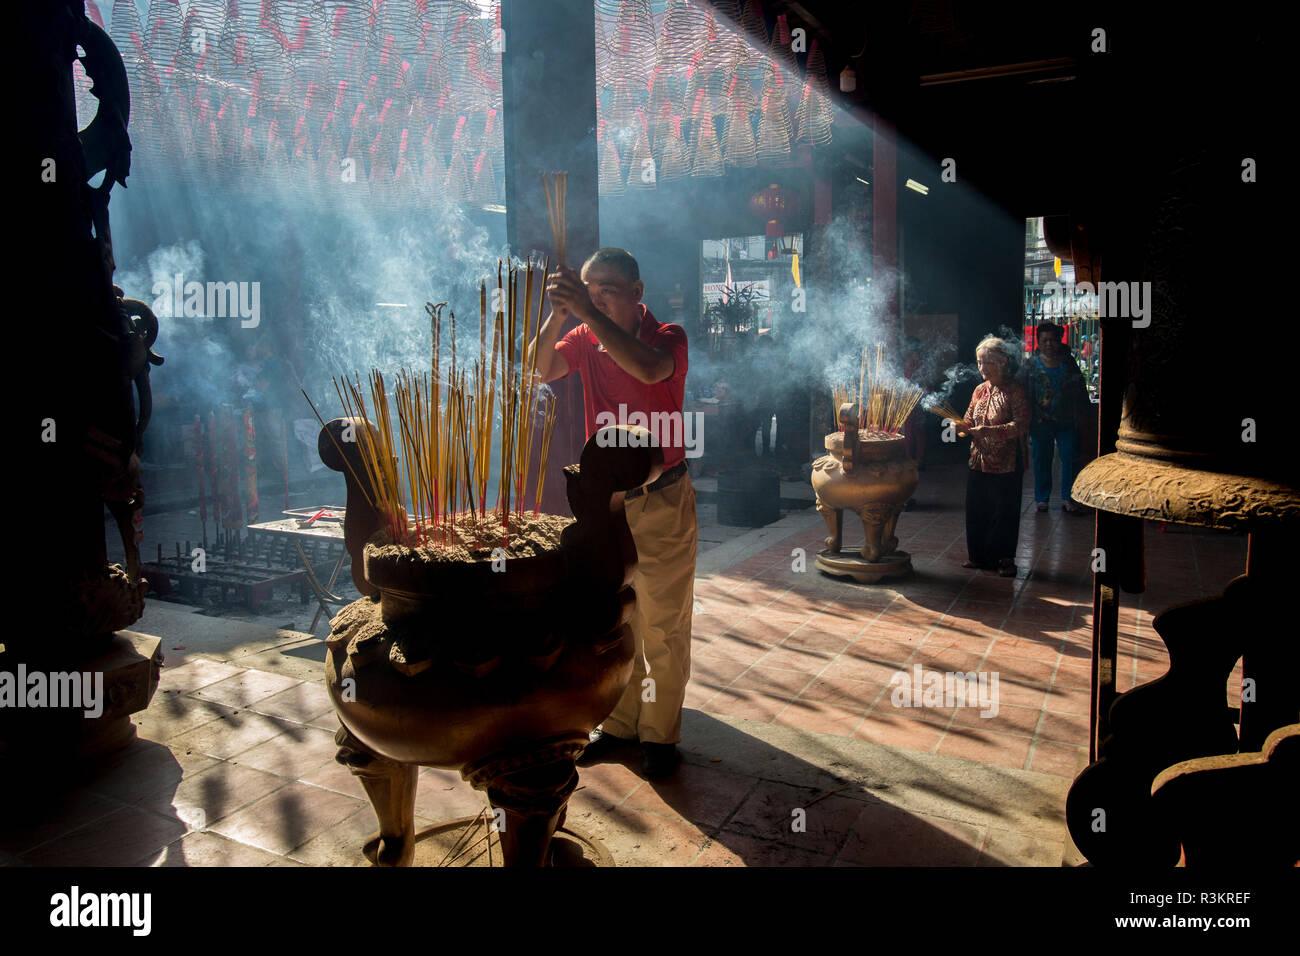 Pagoda. Tet Festival, New Year celebration, Vietnam. - Stock Image